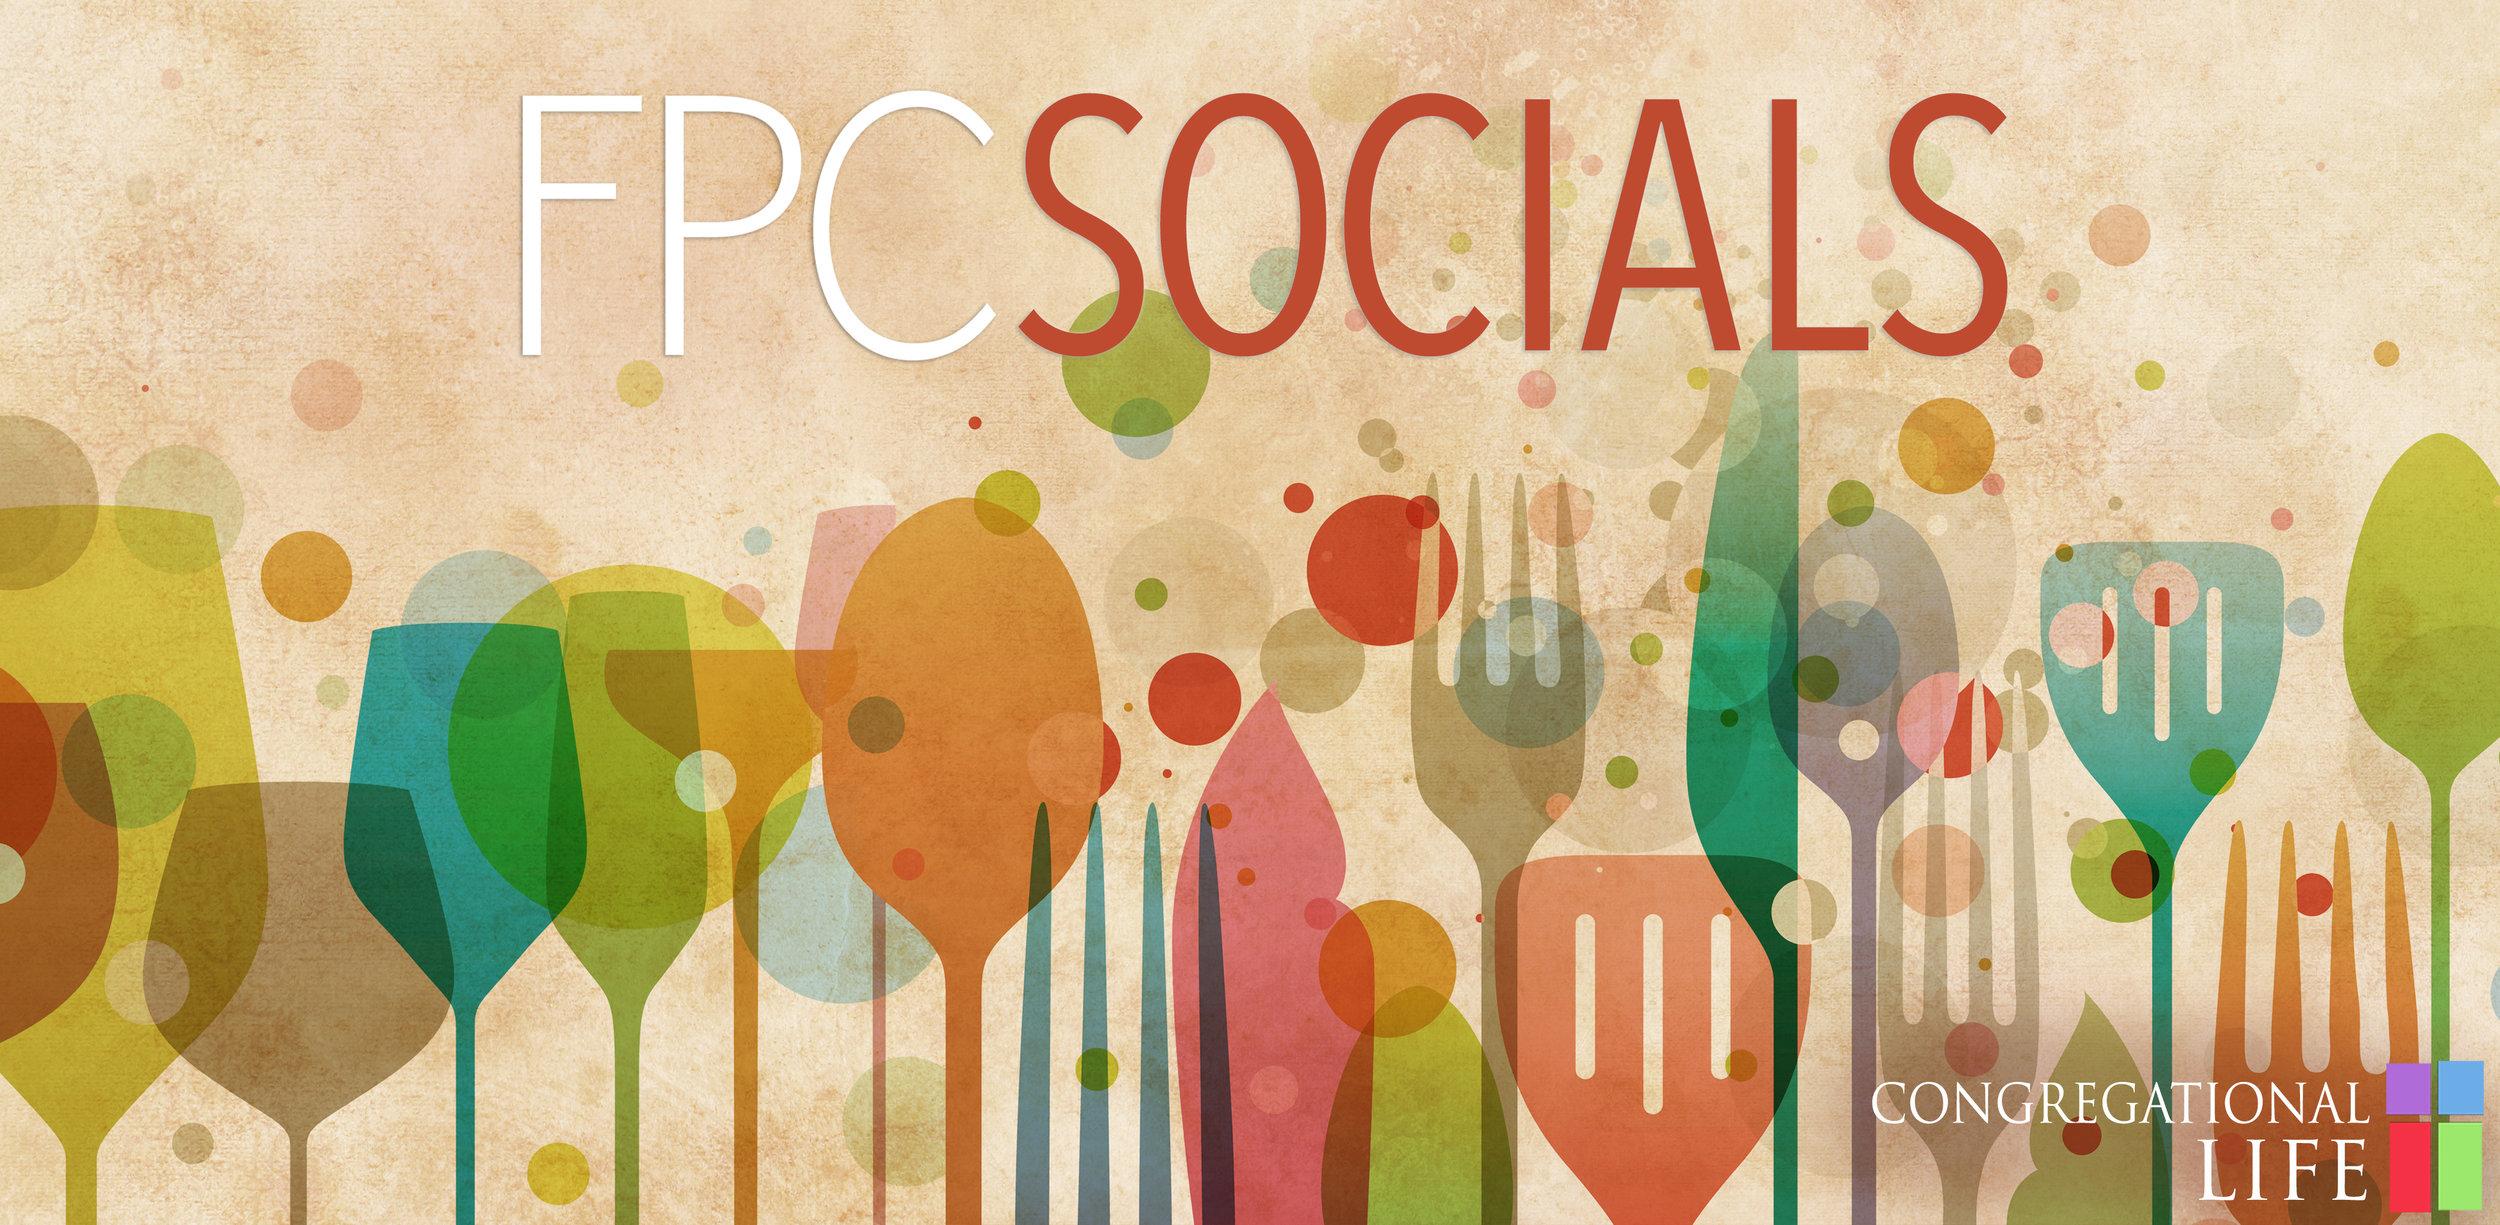 newsocials-page.jpg